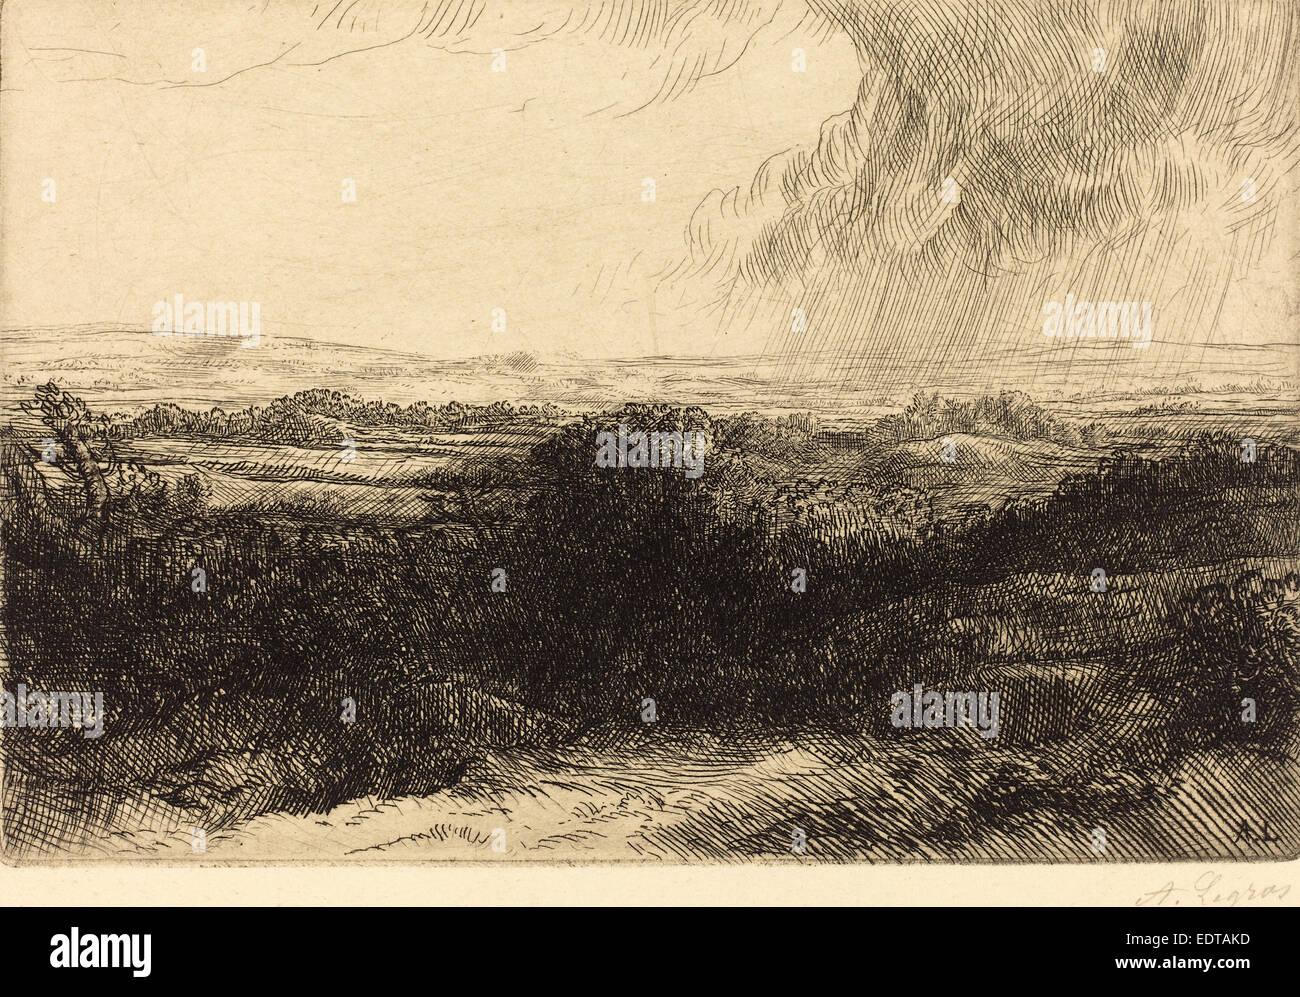 Alphonse Legros, Prospect (Le point de vue), French, 1837 - 1911, etching - Stock Image